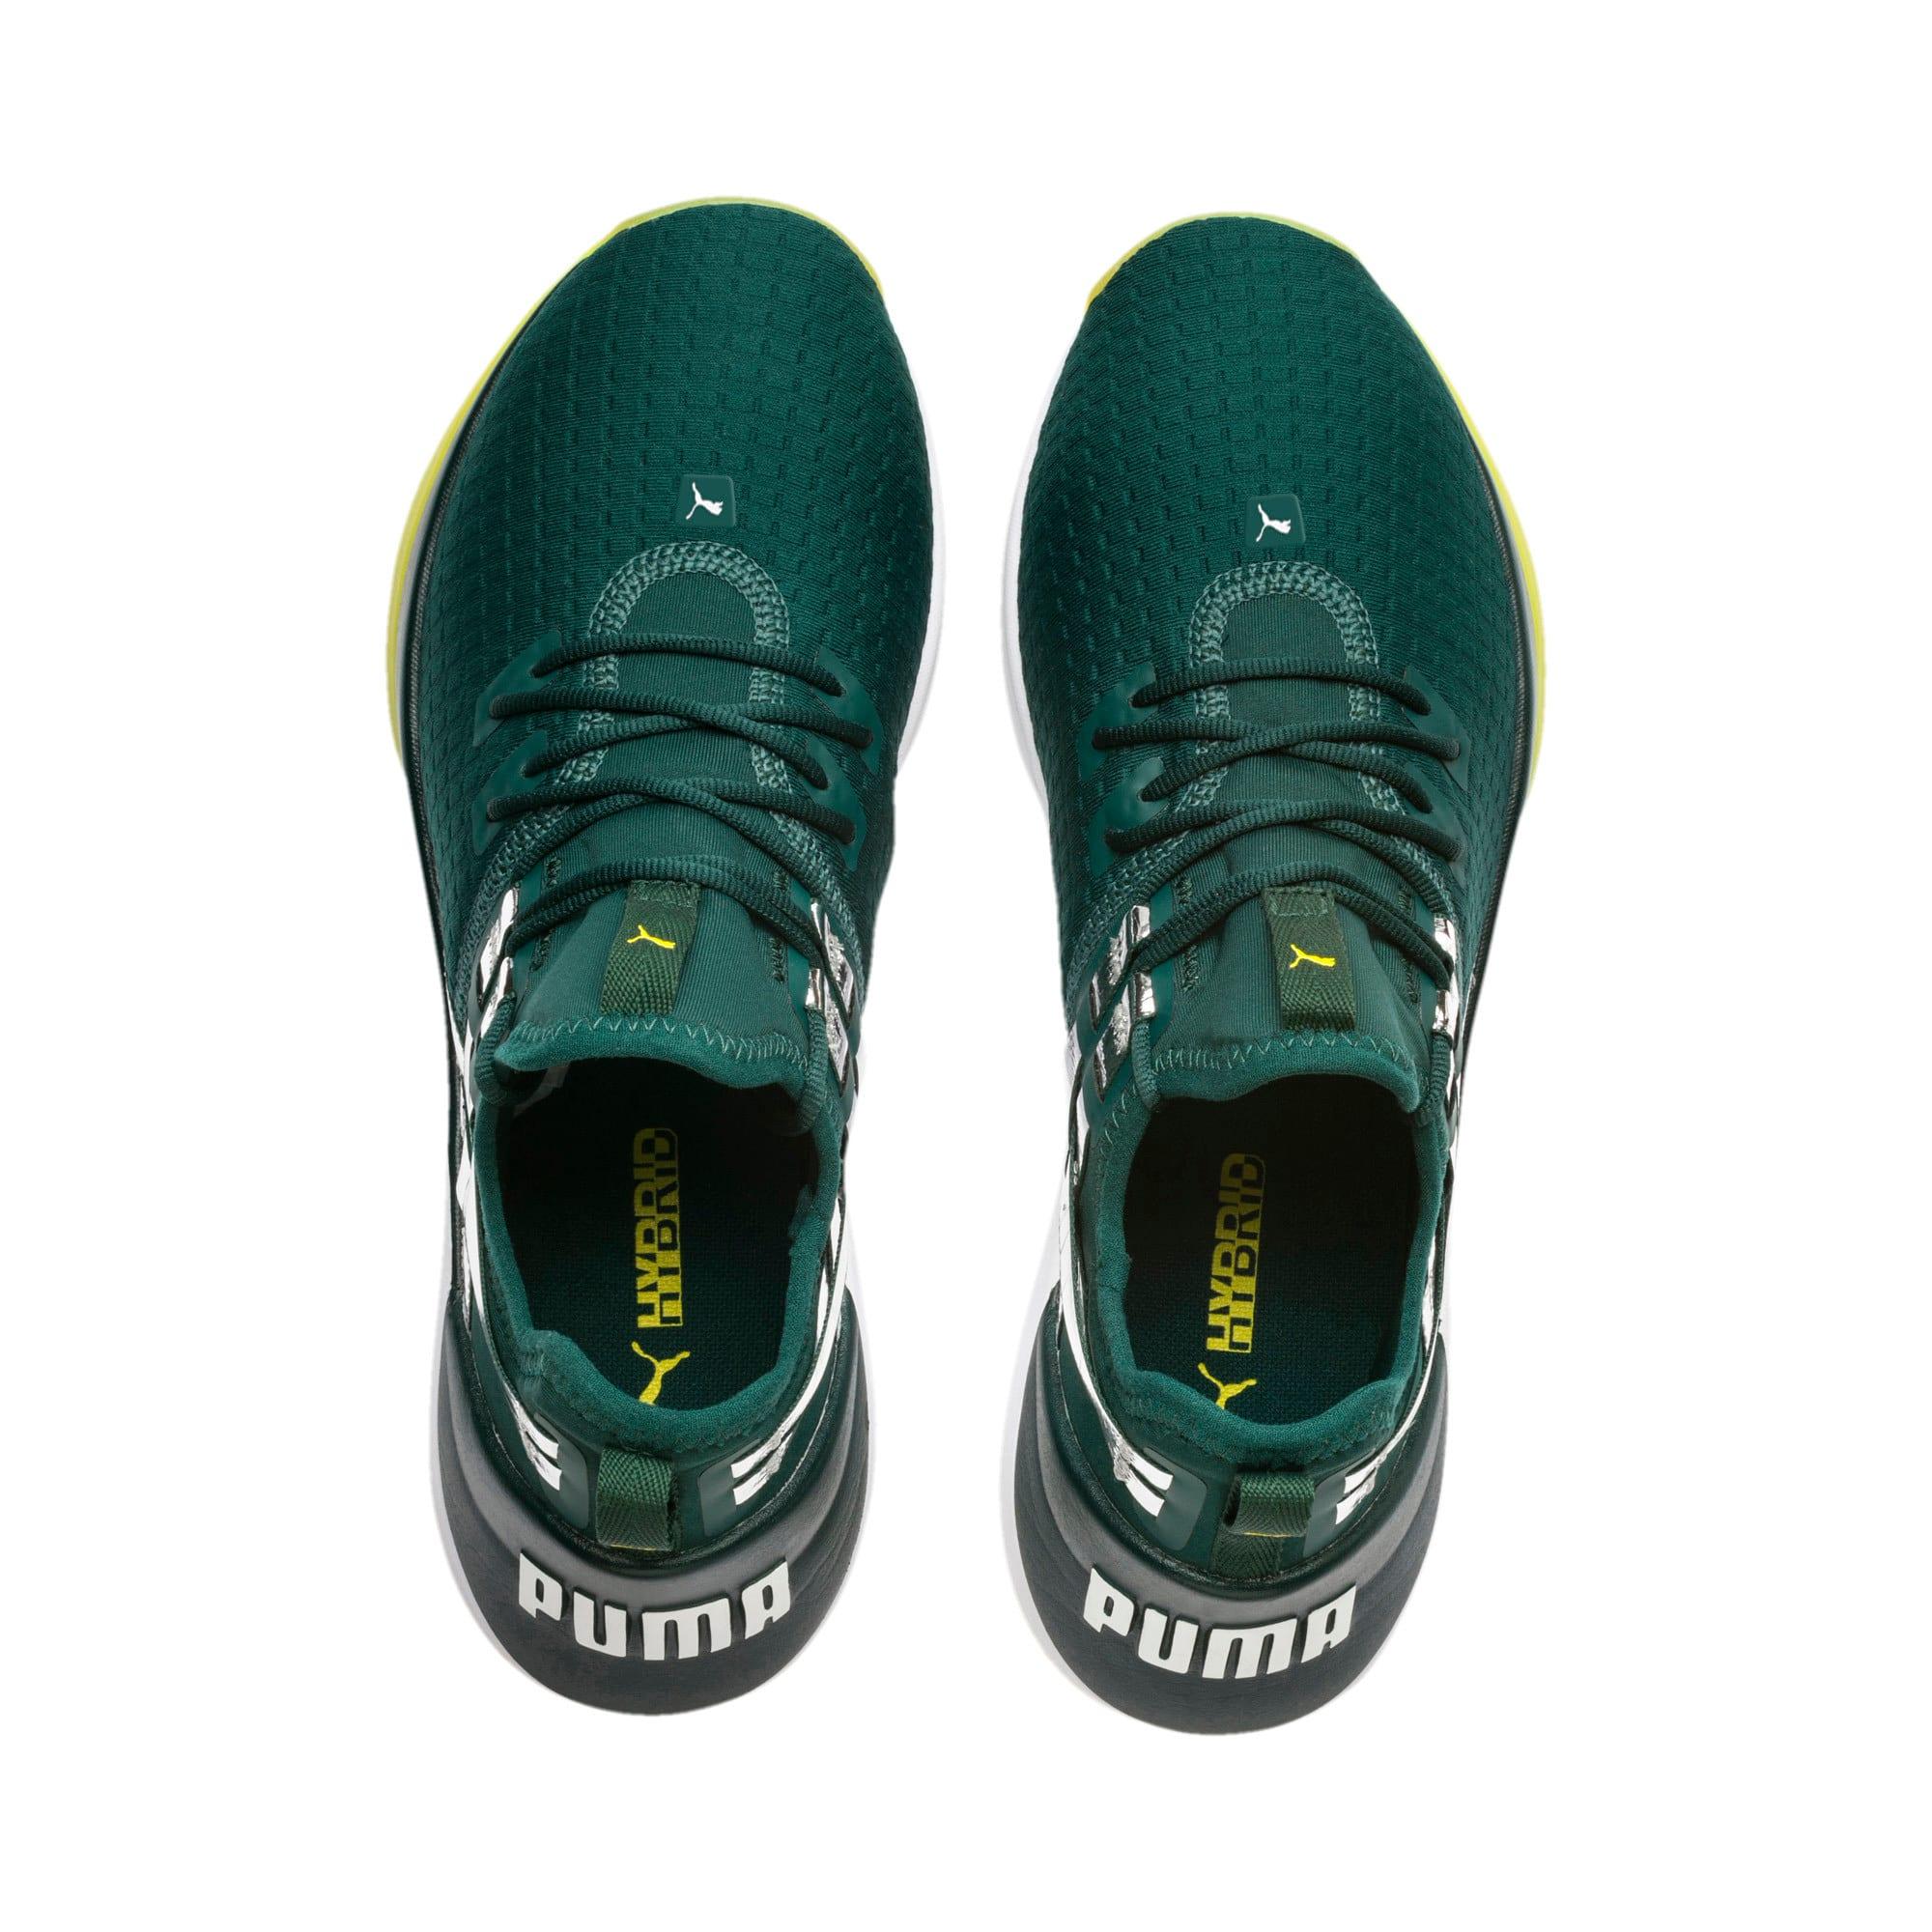 Thumbnail 6 of Jaab XT Trailblazer Women's Training Shoes, Ponderosa Pine-Puma White, medium